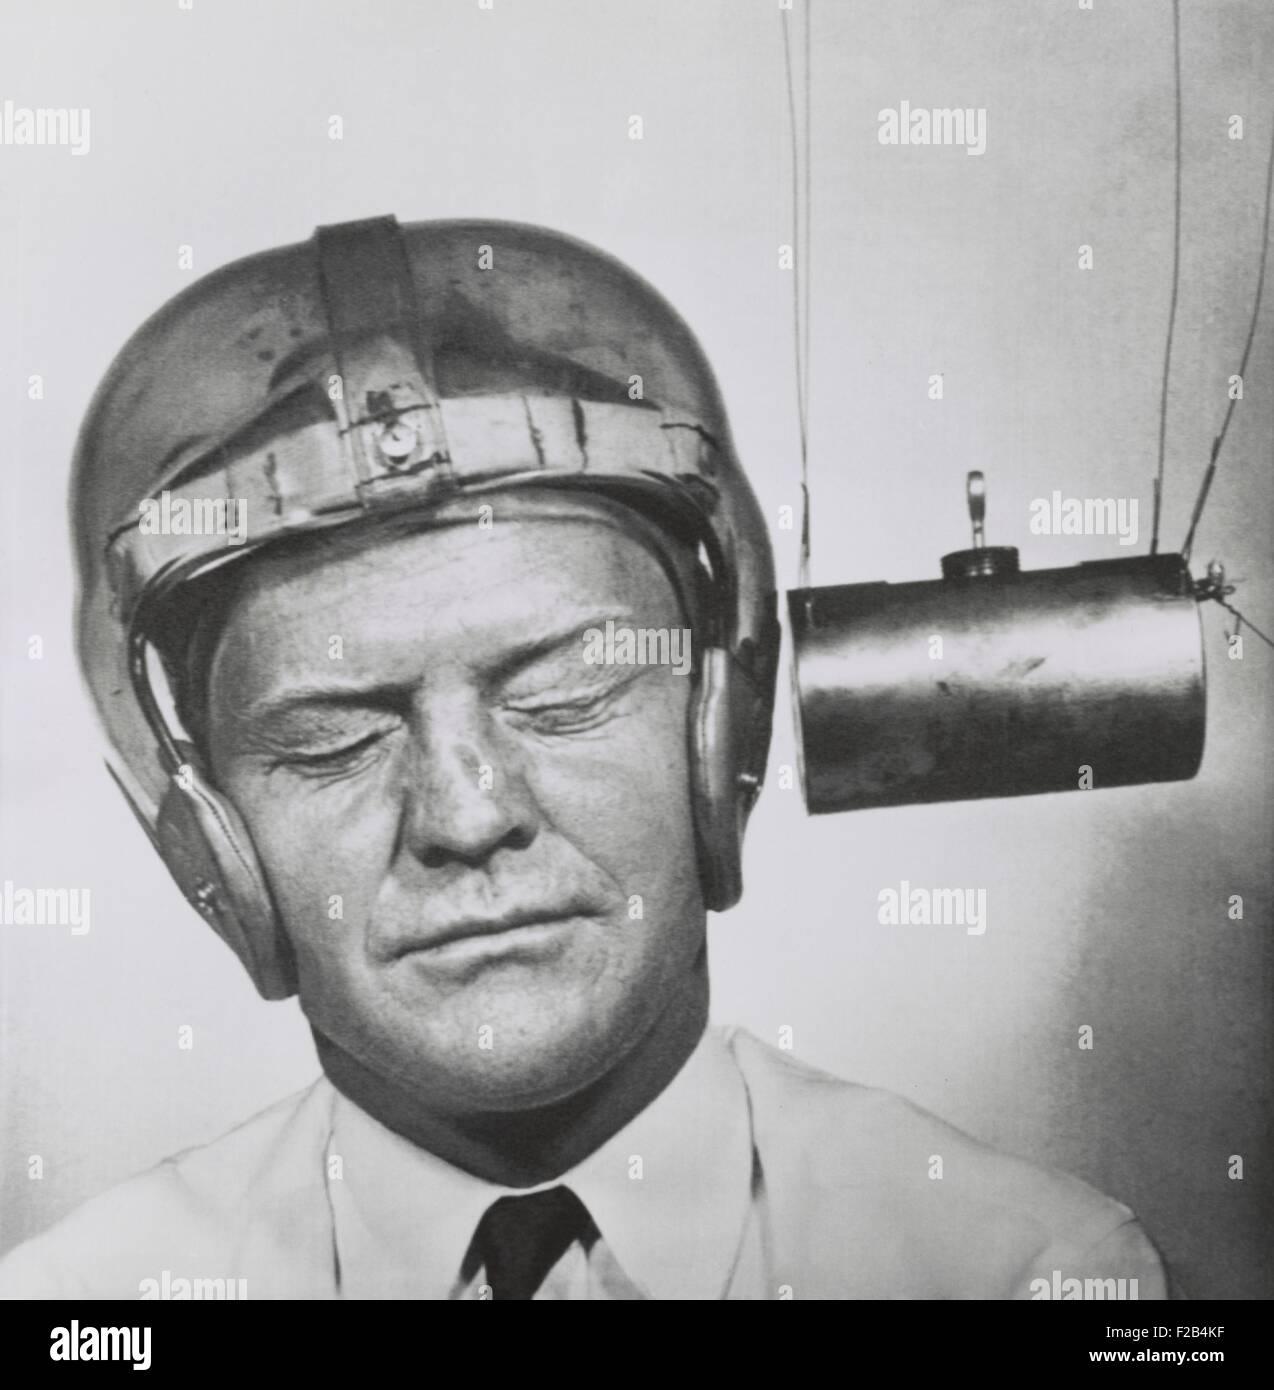 Péndulo golpeando un plástico casco usado para probar para mejorar tocados para jugadores de fútbol. Sept.13, 1950 Foto de stock